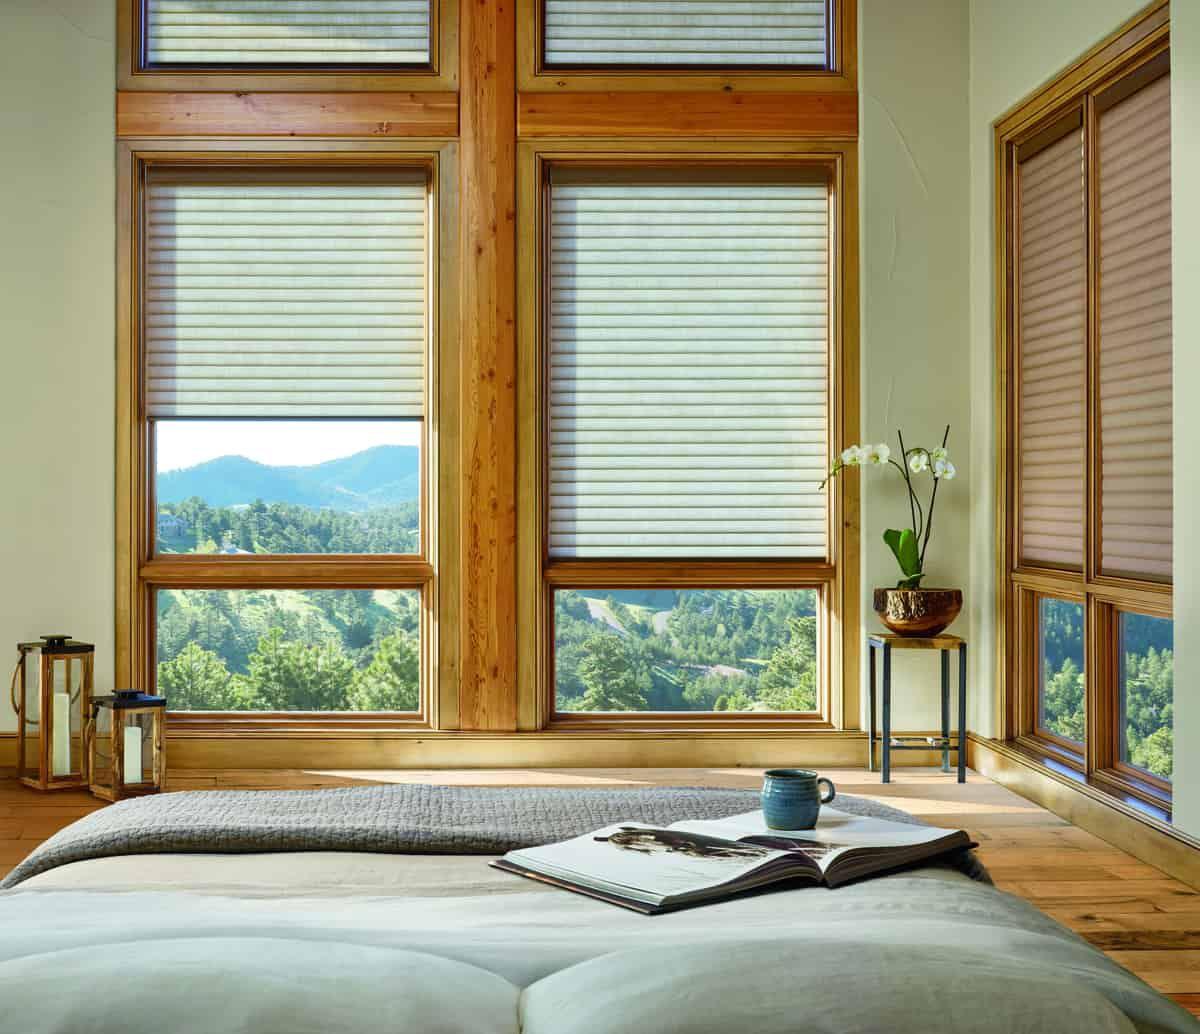 Benefits of Sonnette Cellular Roller Shades for Homes Near Hoboken, New Jersey (NJ) for Energy Efficiency